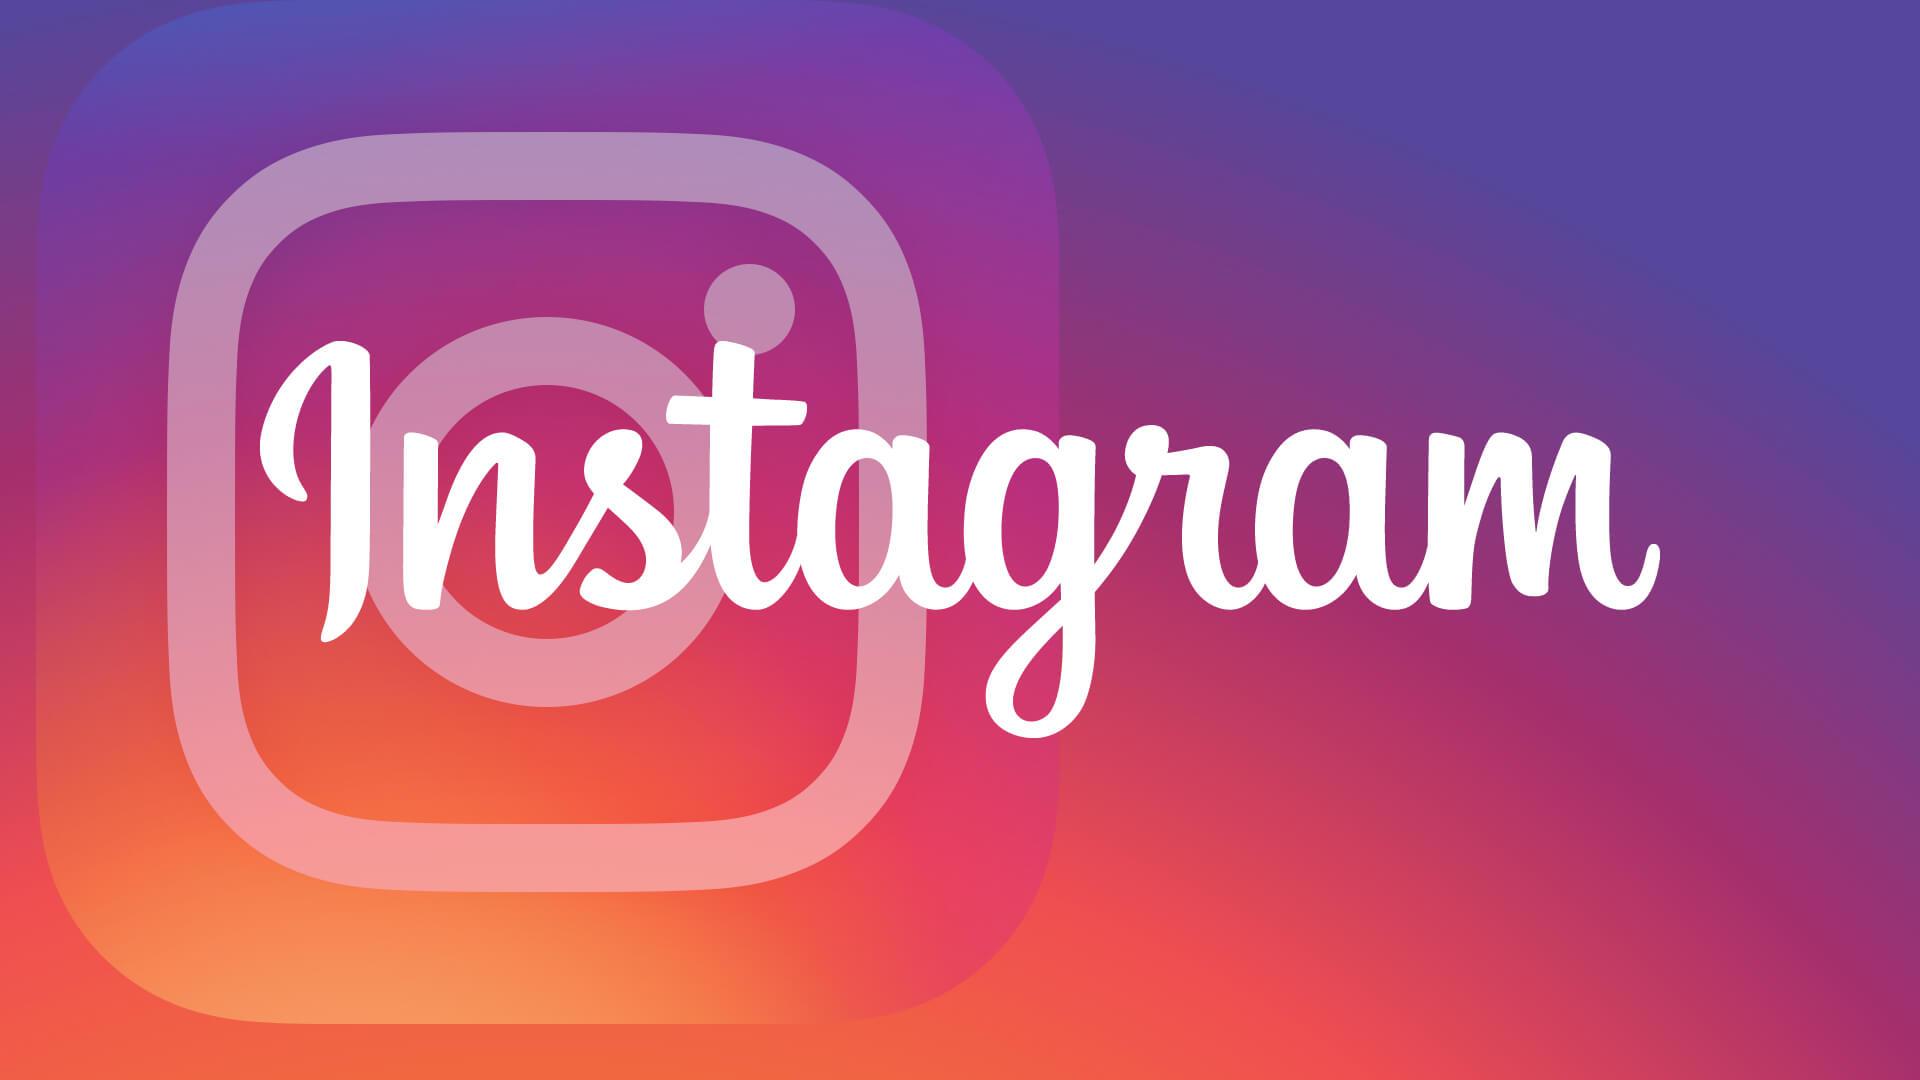 Instagram Support anschreiben! Per Telefon E-Mail oder Formular?